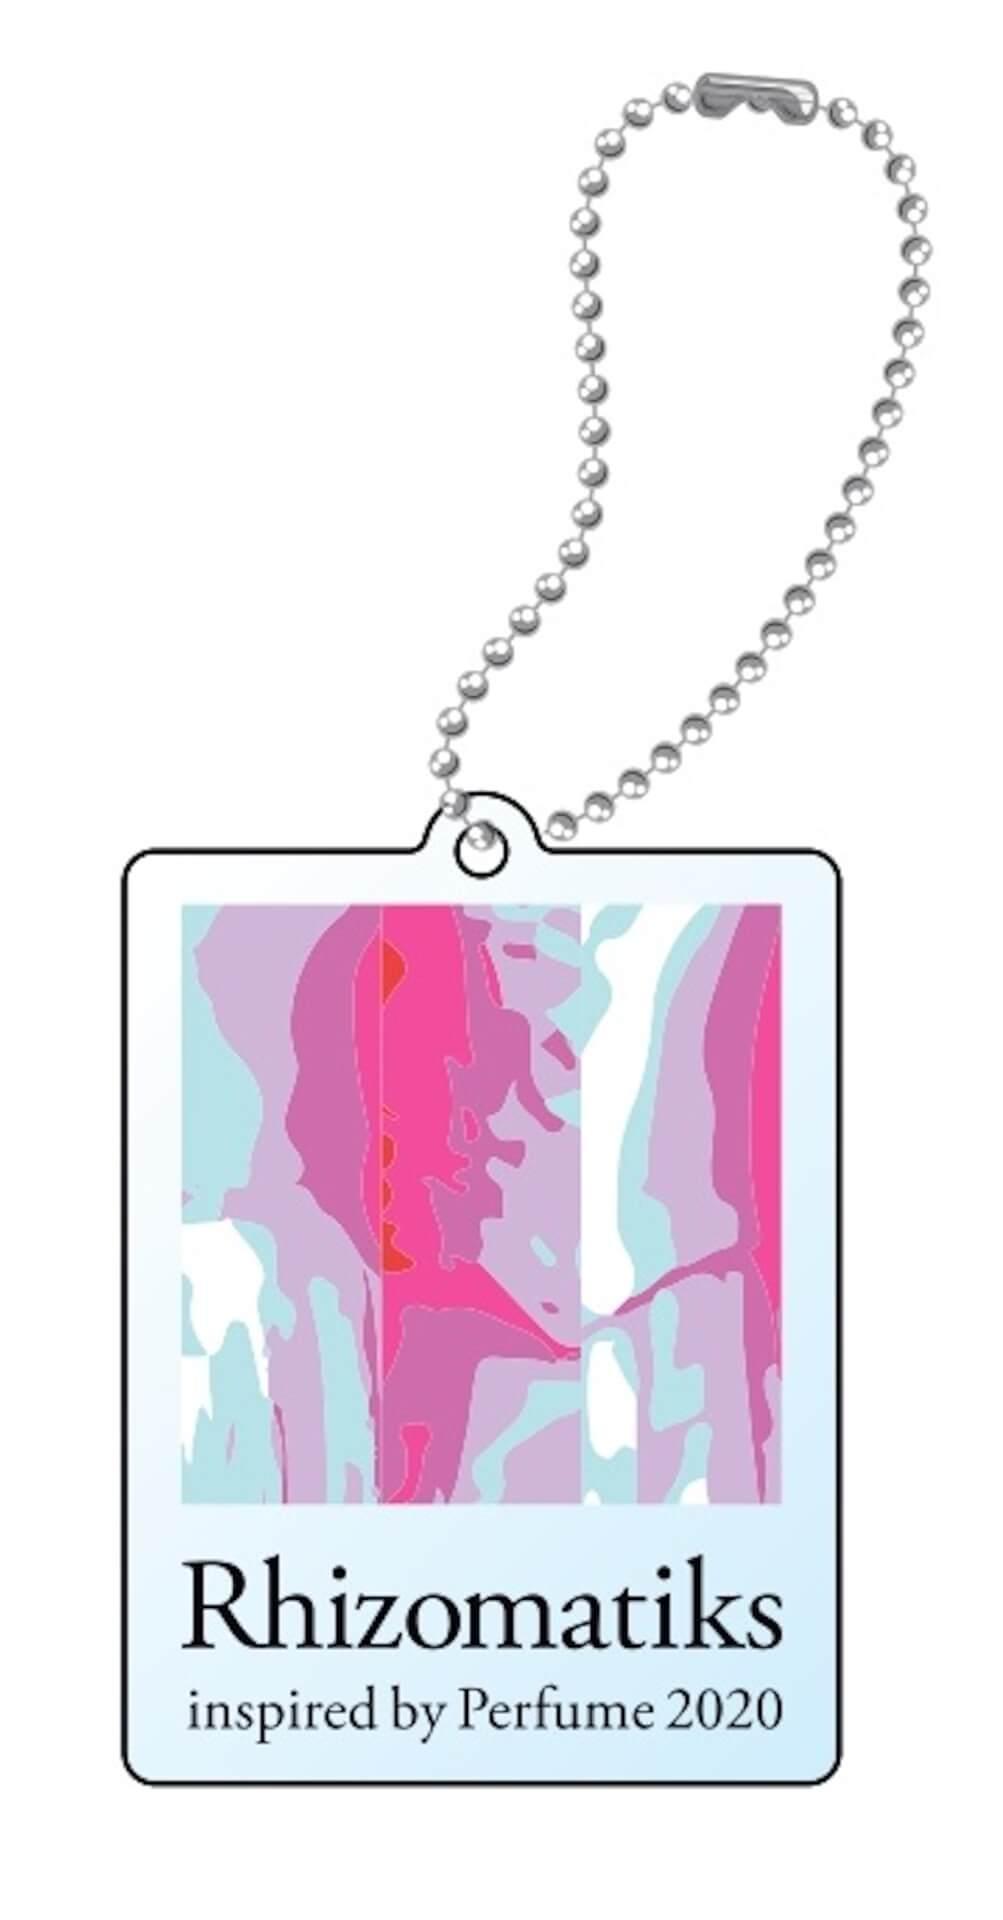 Perfume舞台演出の裏側を体験!<Rhizomatiks inspired by Perfume 2020>が渋谷PARCO MUSEUMで開催! ac200109_rhizomatiksparco_07